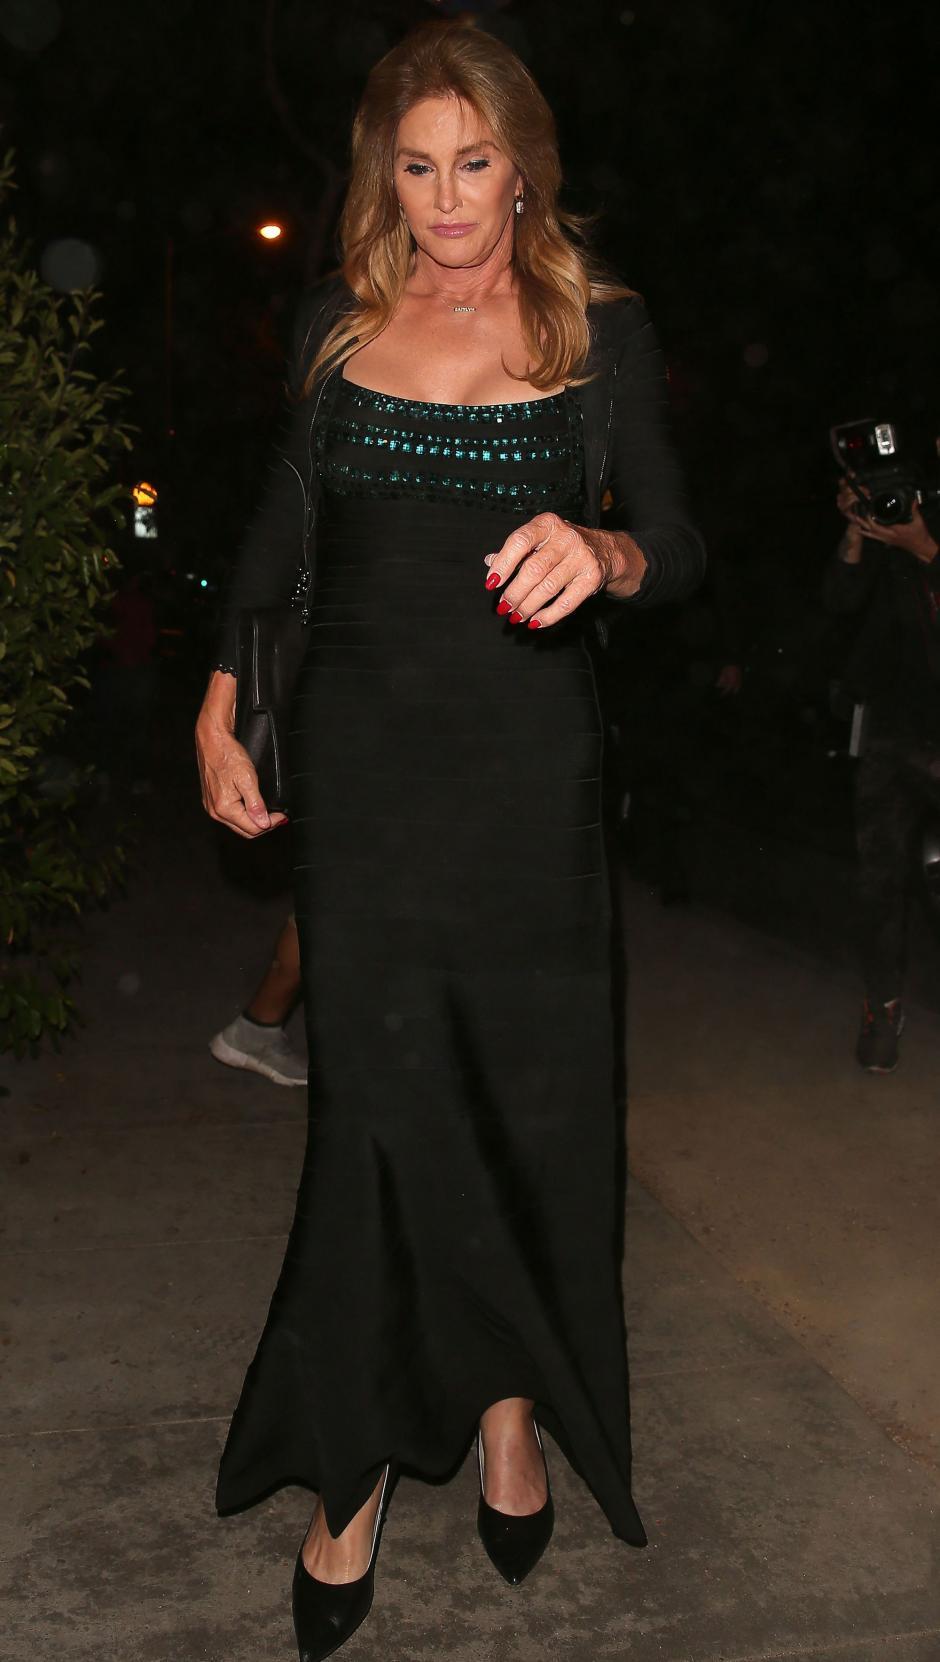 A la cena no podía faltar Caitlyn Jenner. (Foto: people)